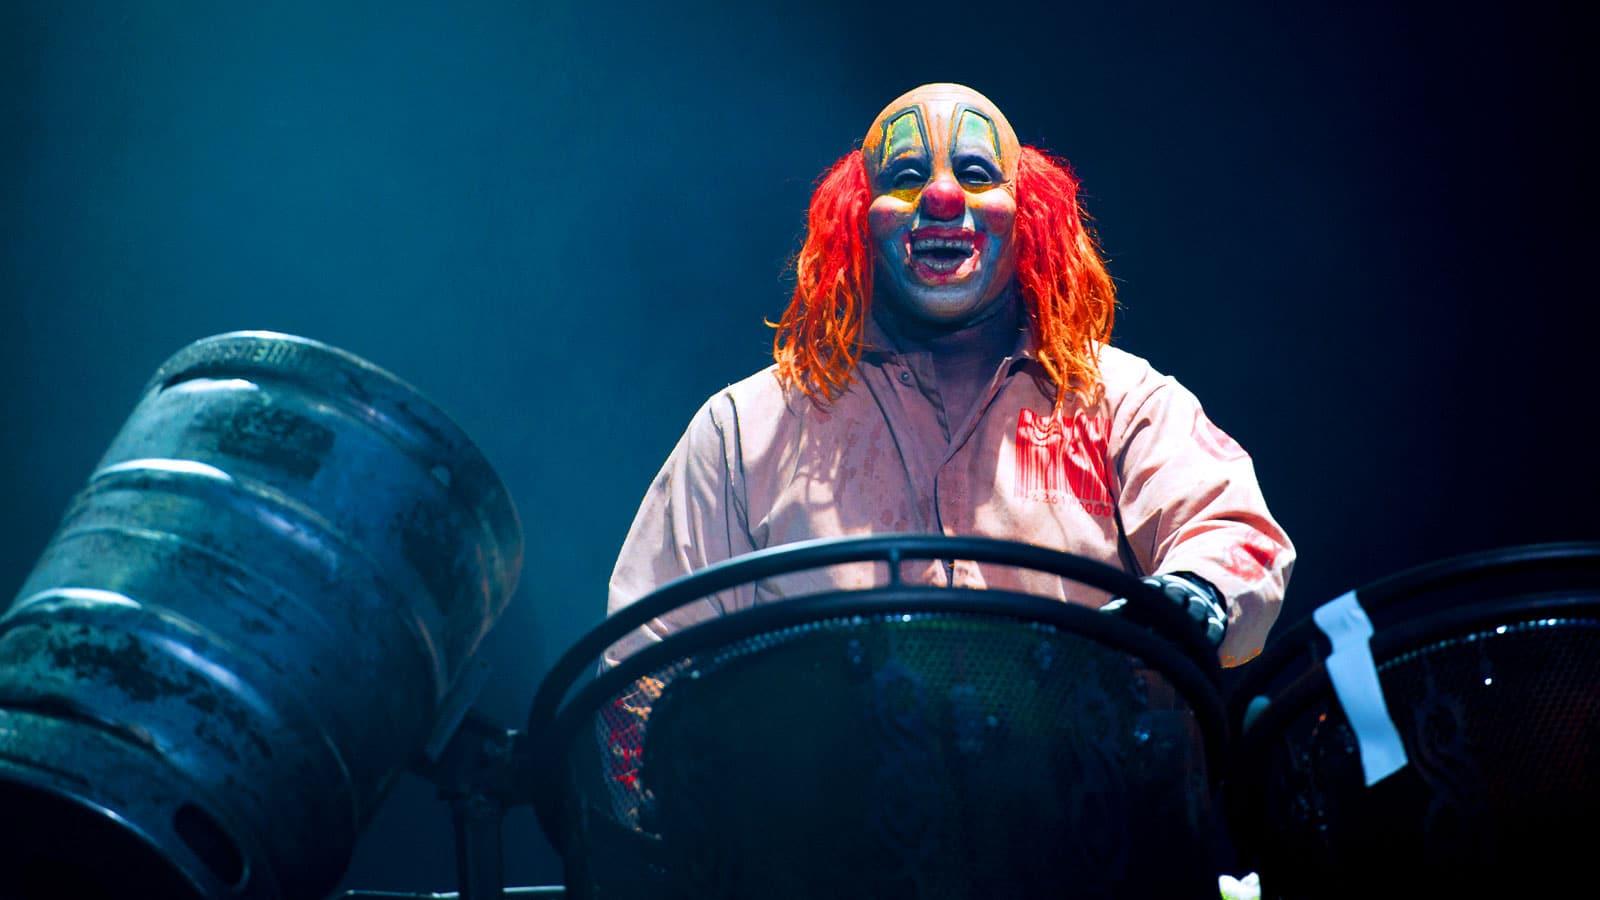 40ef50a3 clown